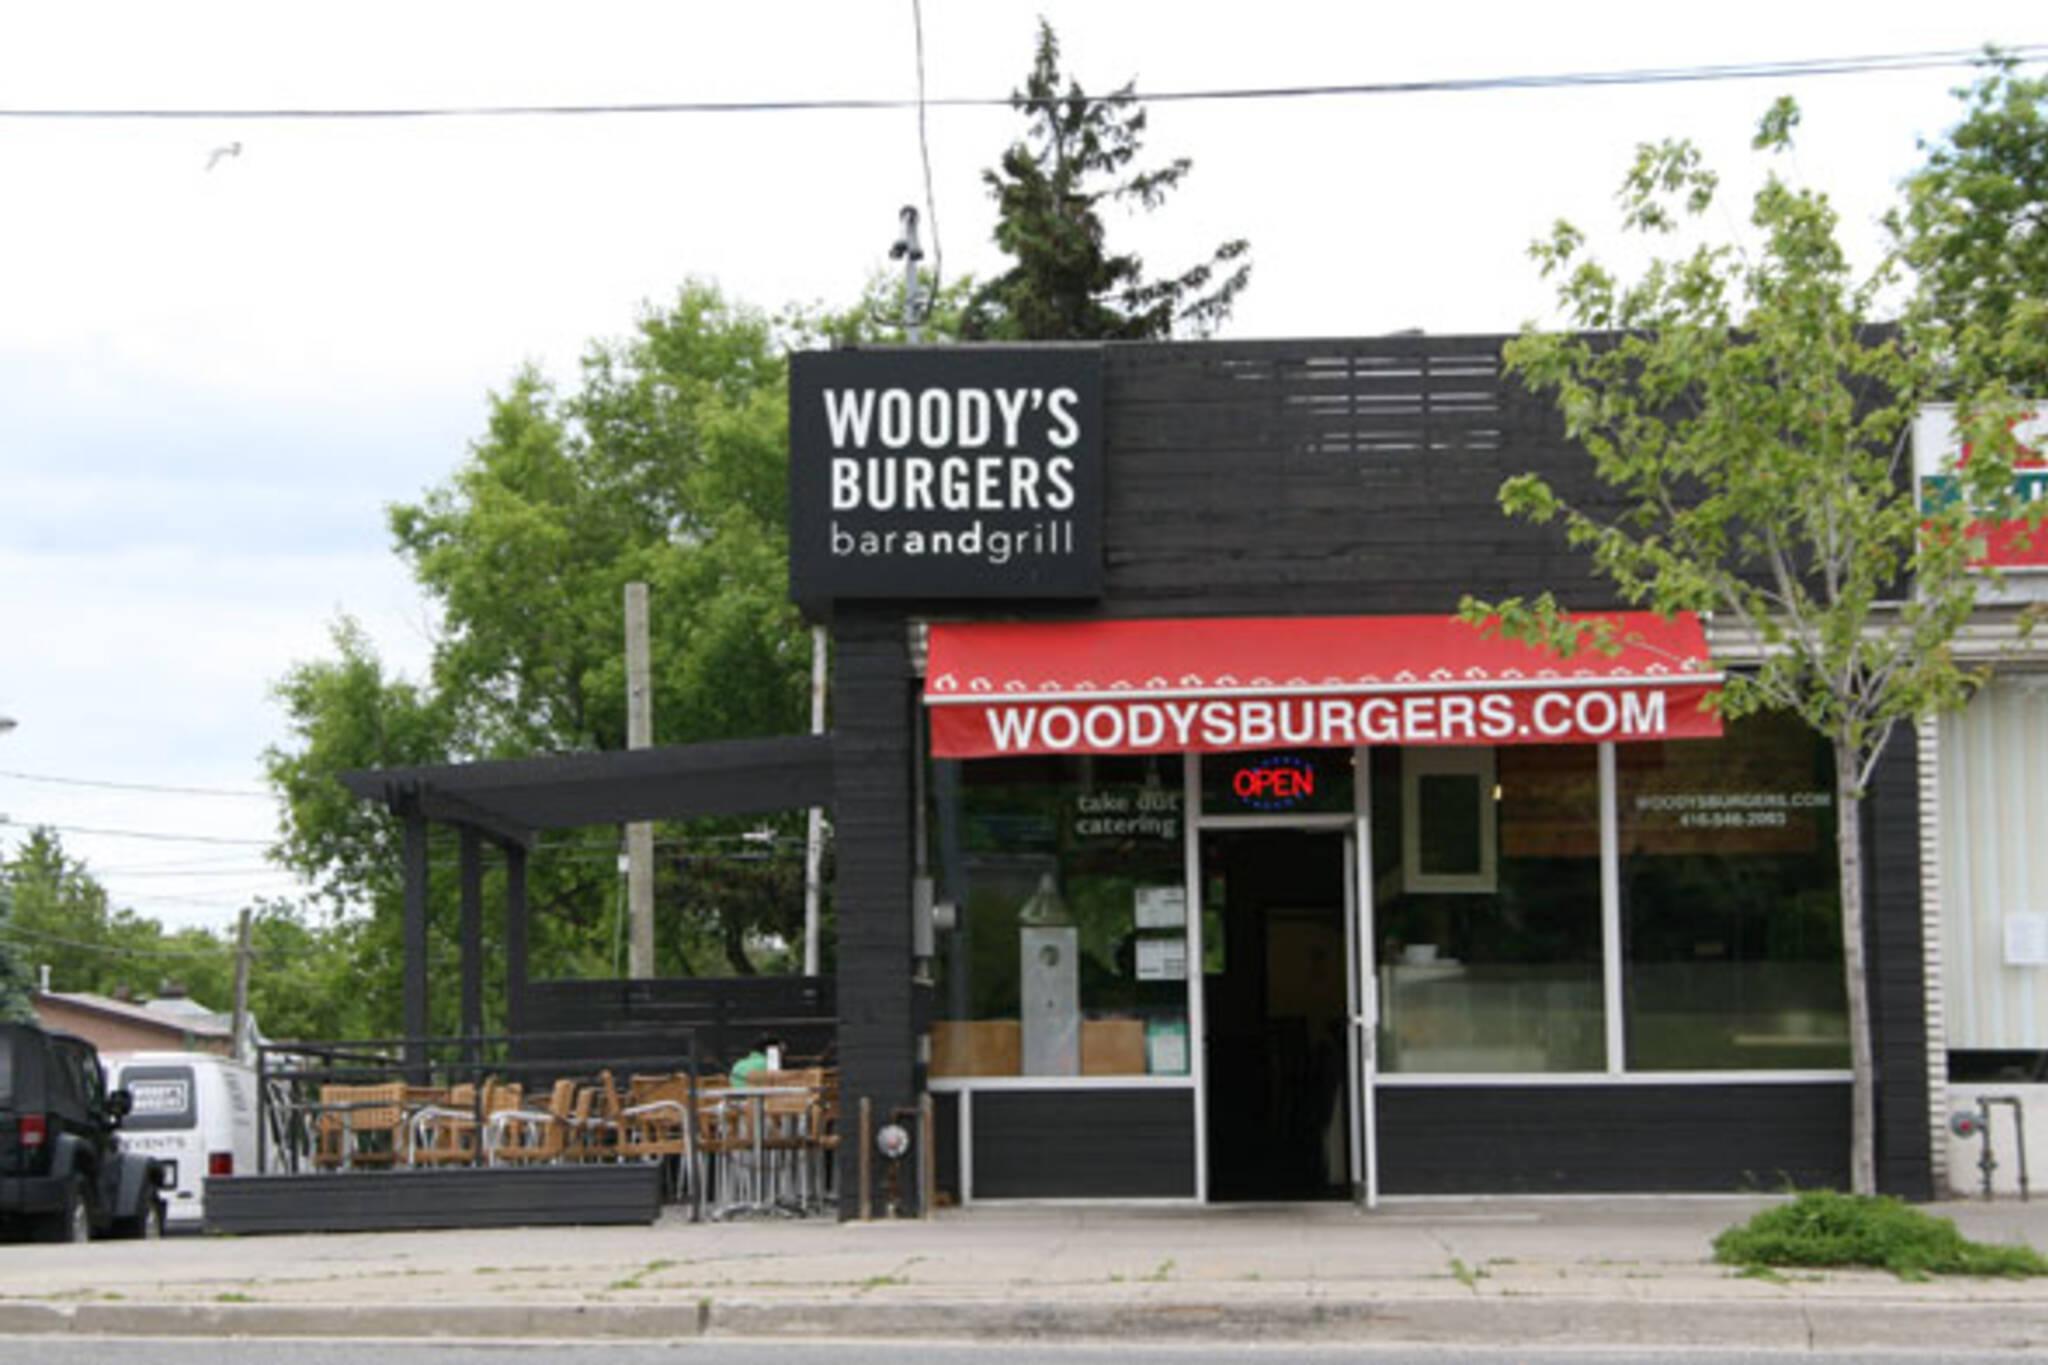 Woody's Burgers Toronto